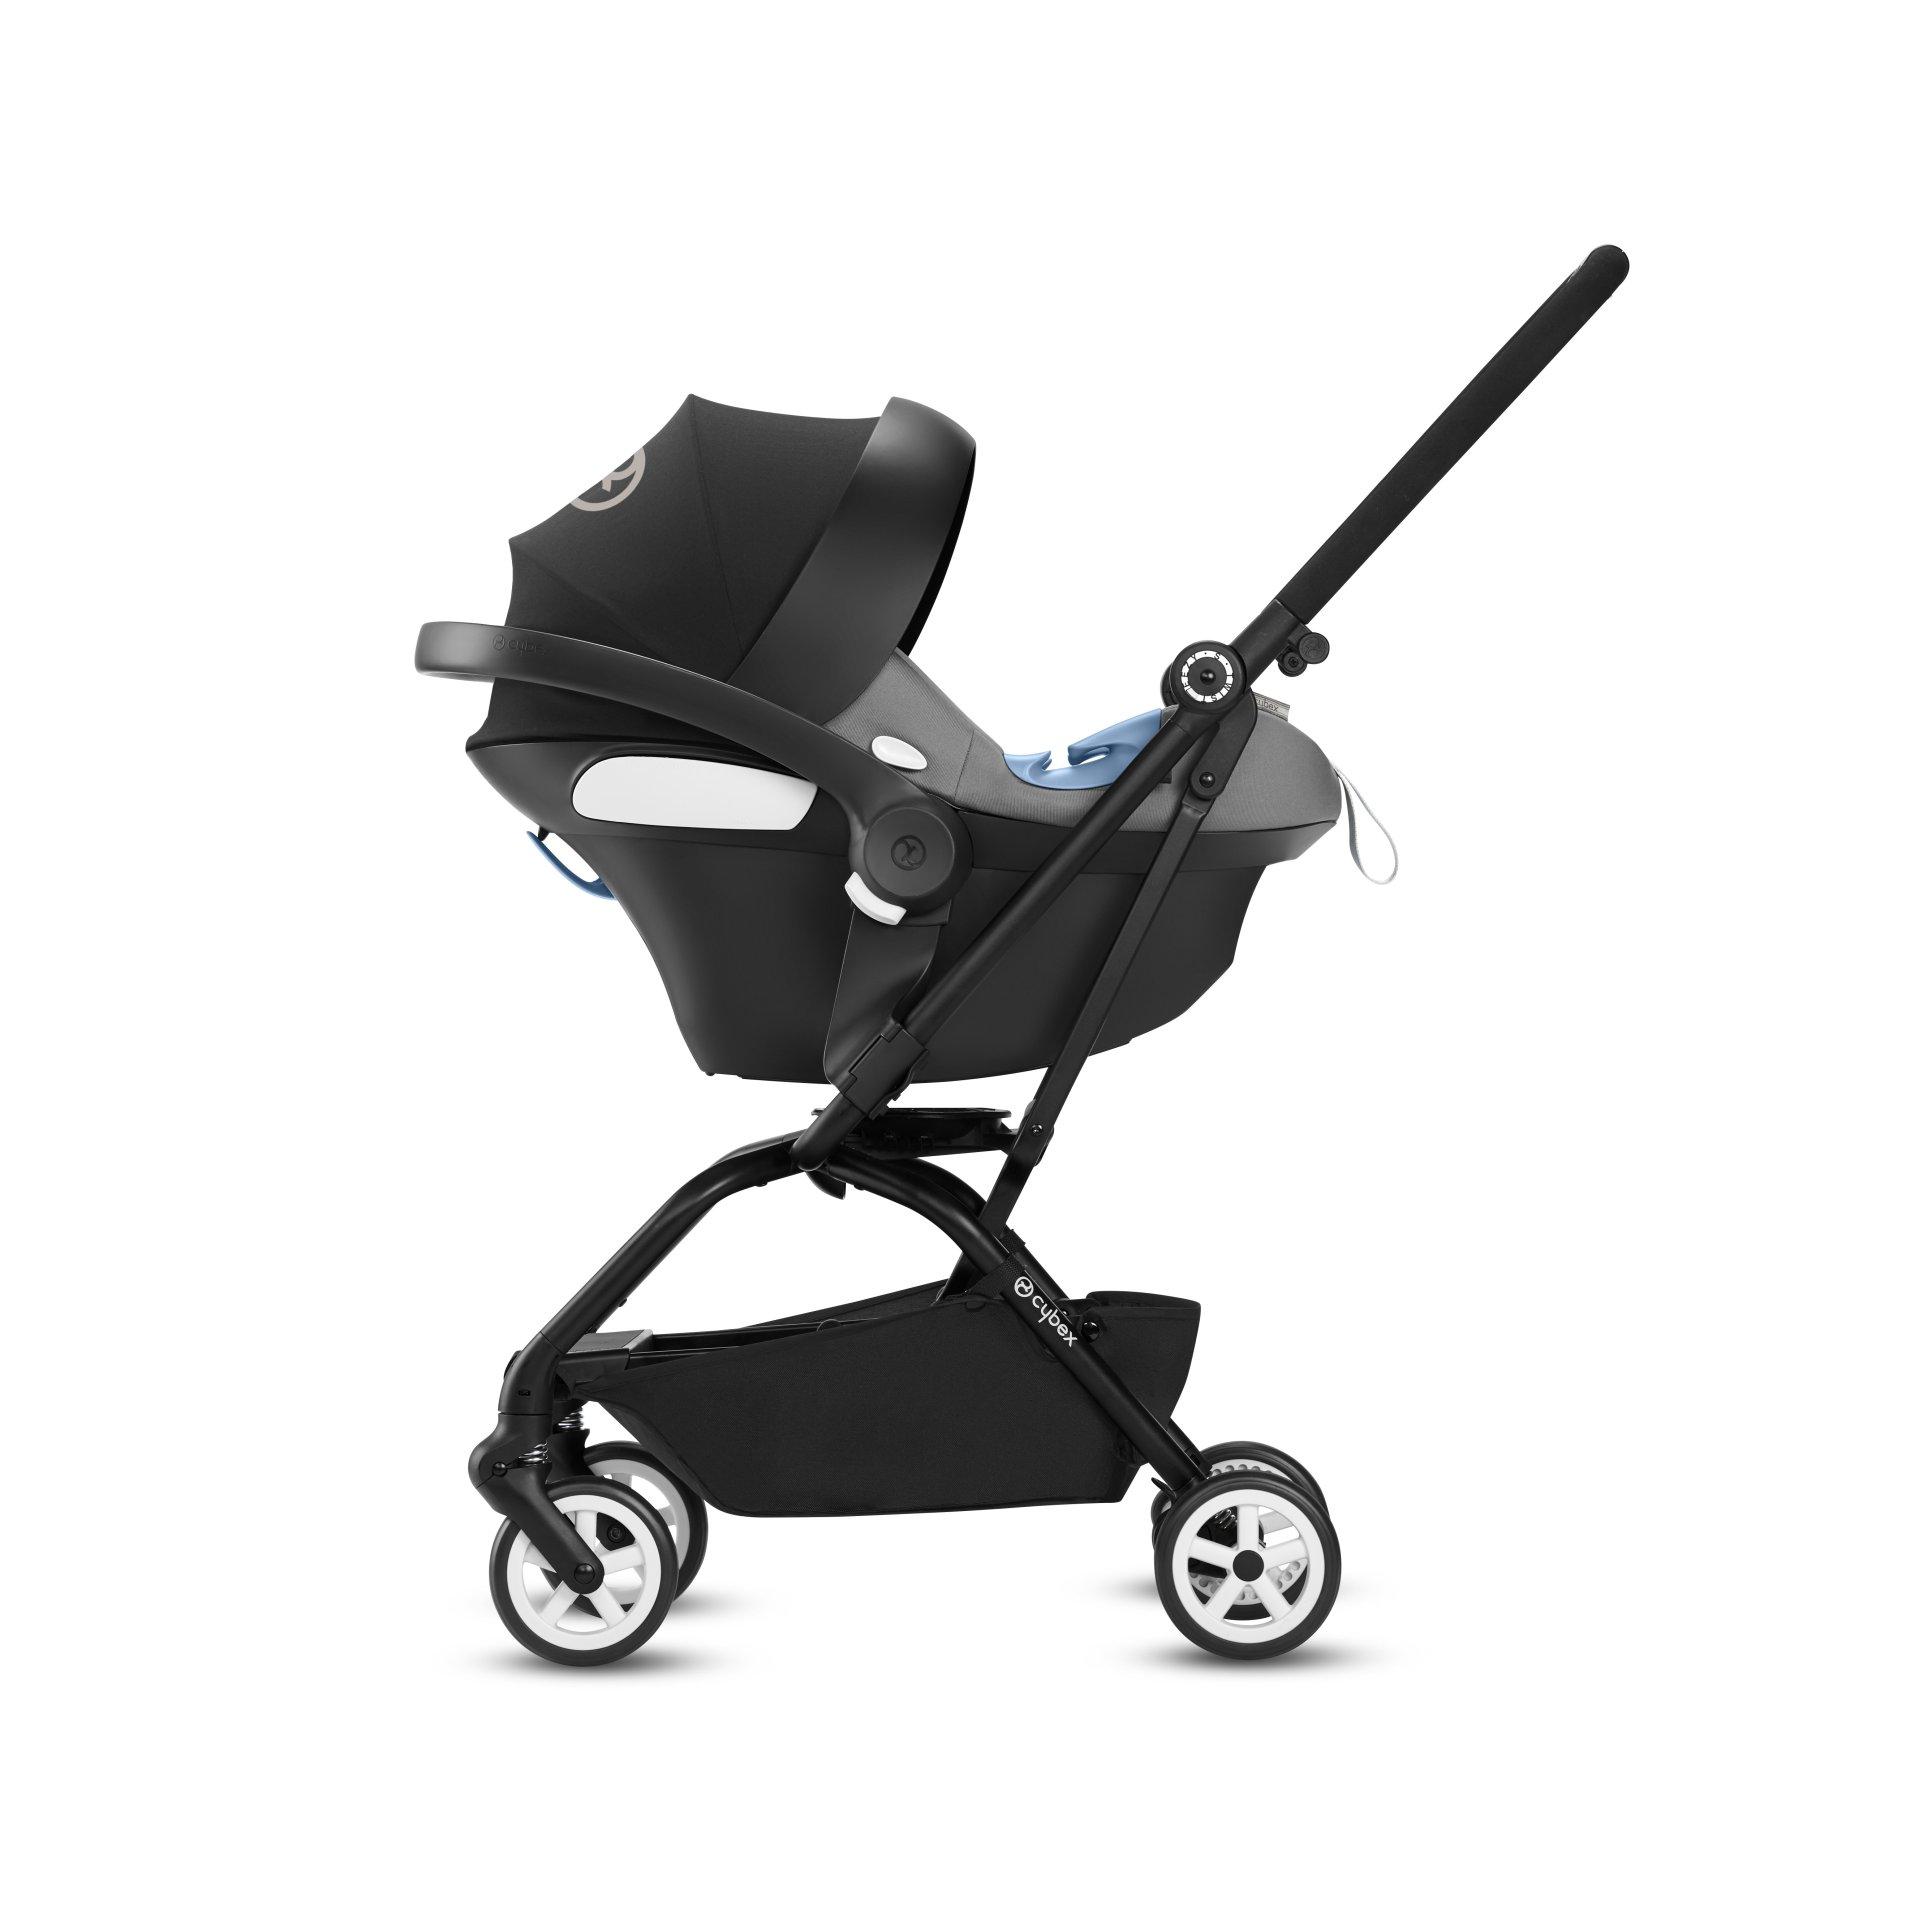 cybex buggy eezy s twist 2018 rebel red red buy at kidsroom strollers. Black Bedroom Furniture Sets. Home Design Ideas